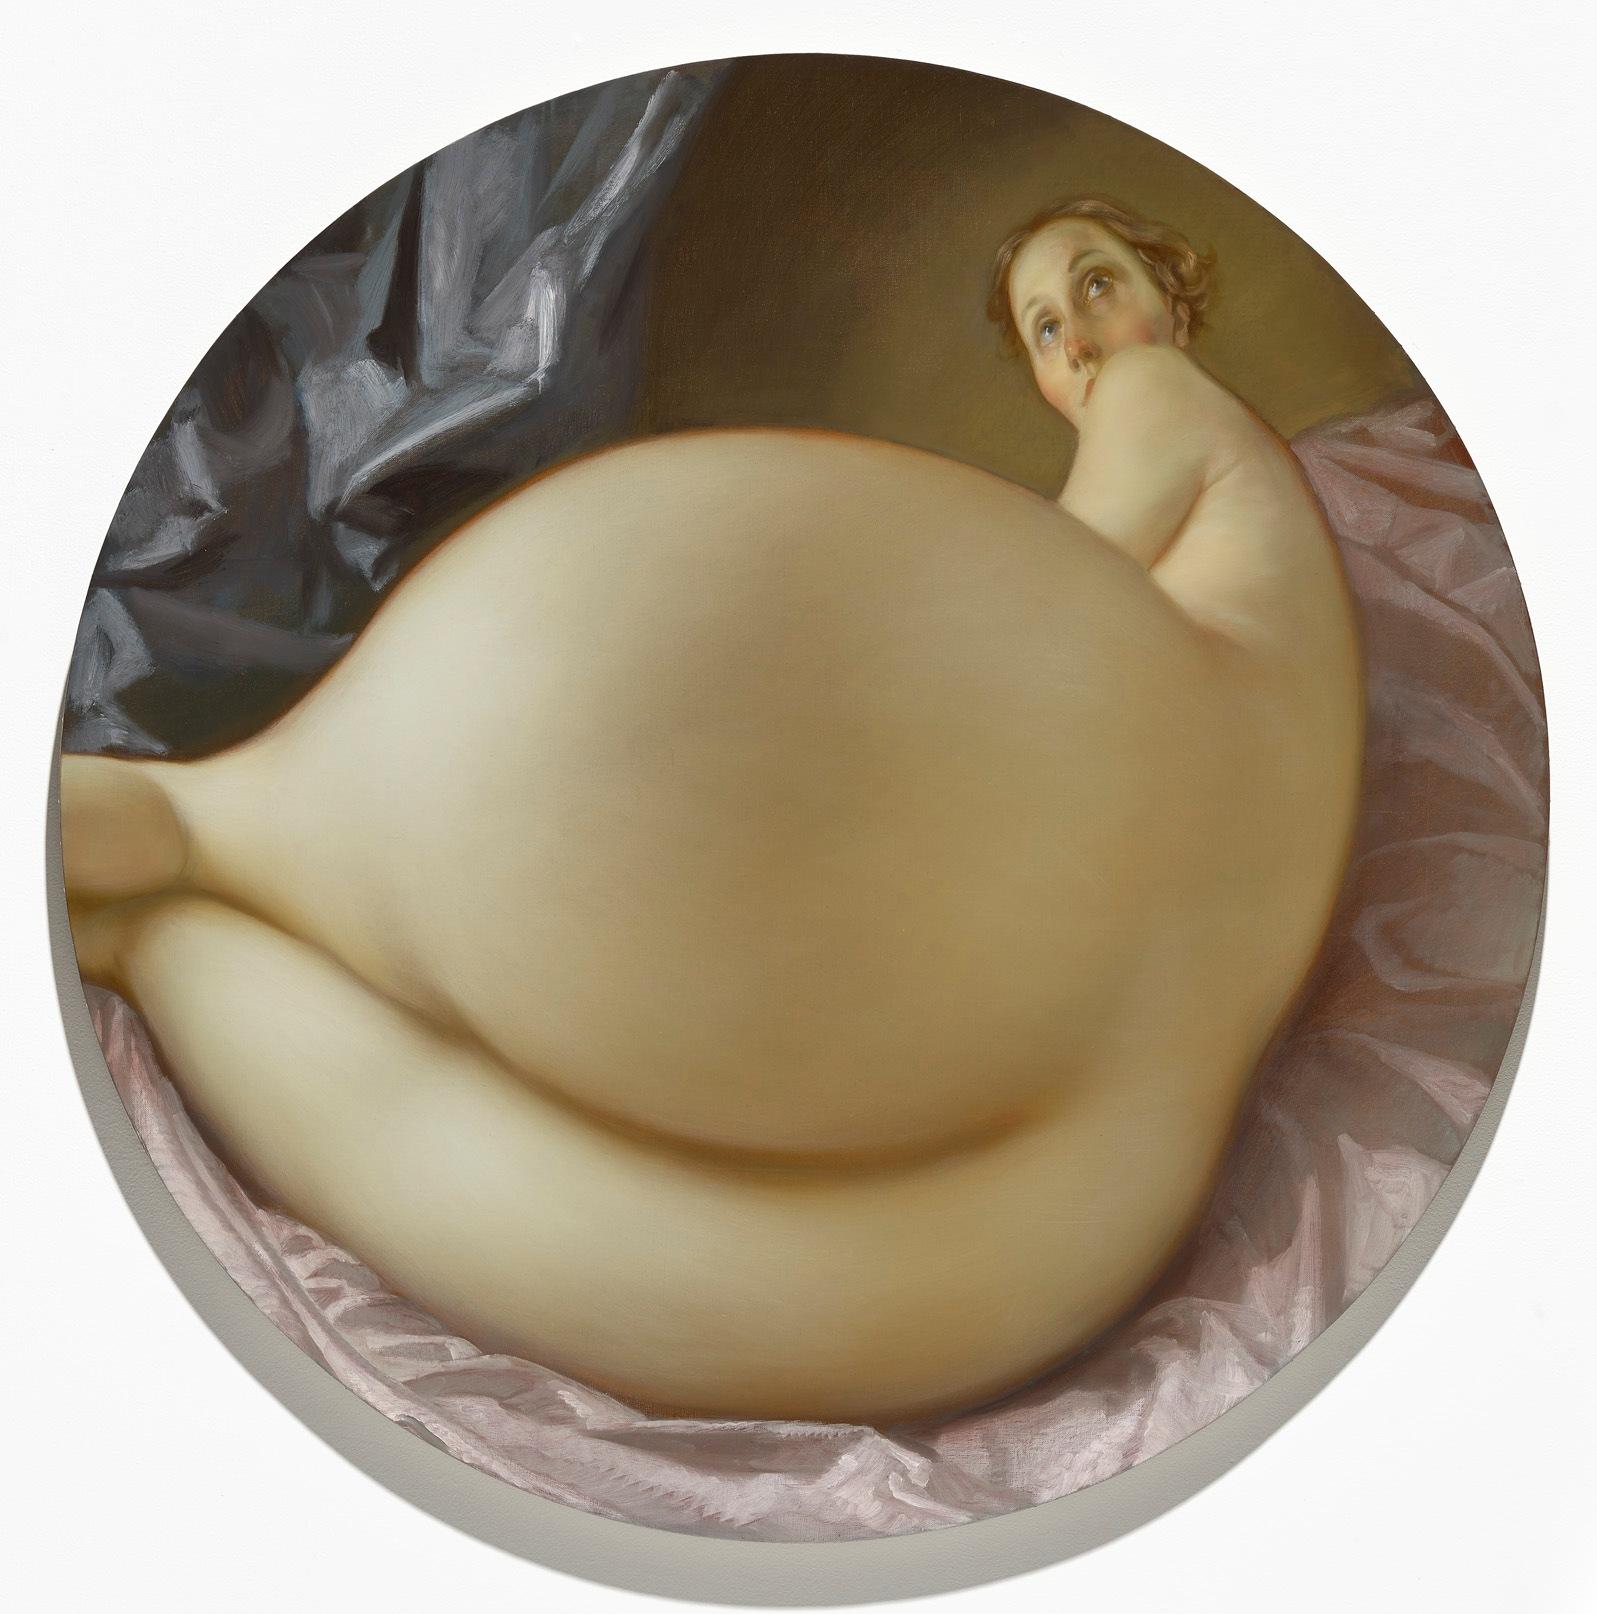 nude in a convex mirror currin